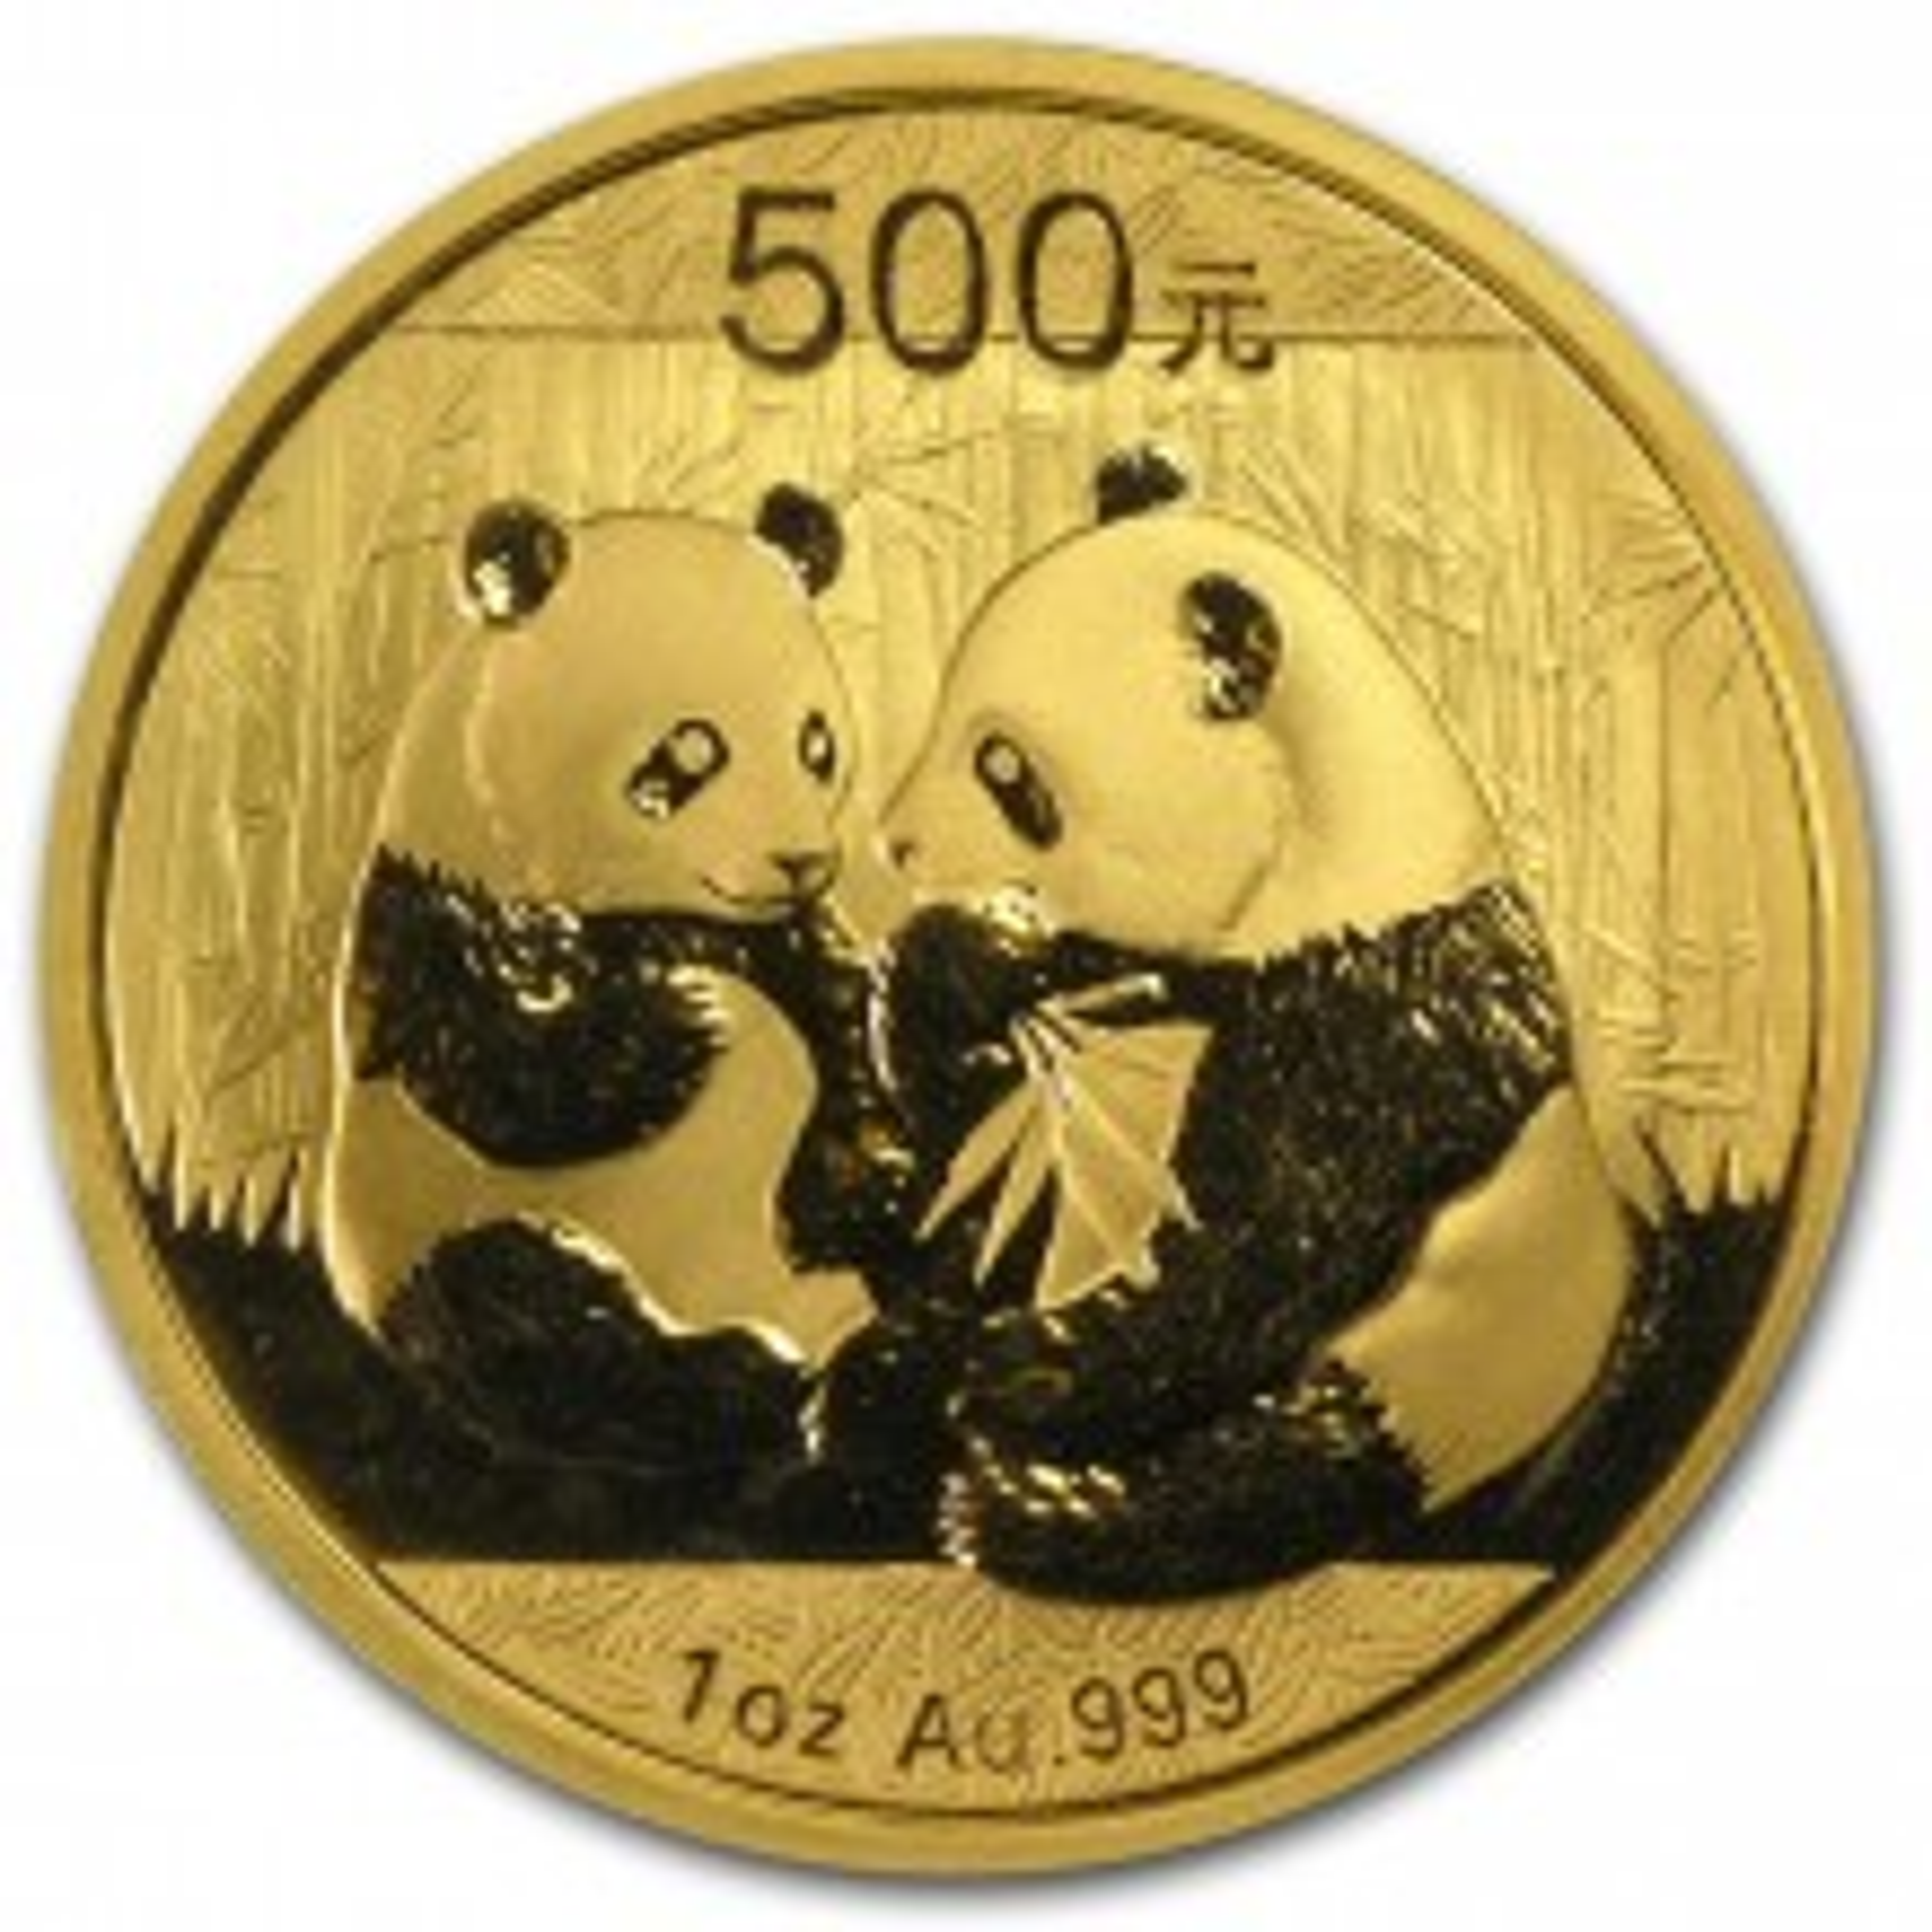 1 Troy ounce gold Panda coin 2009